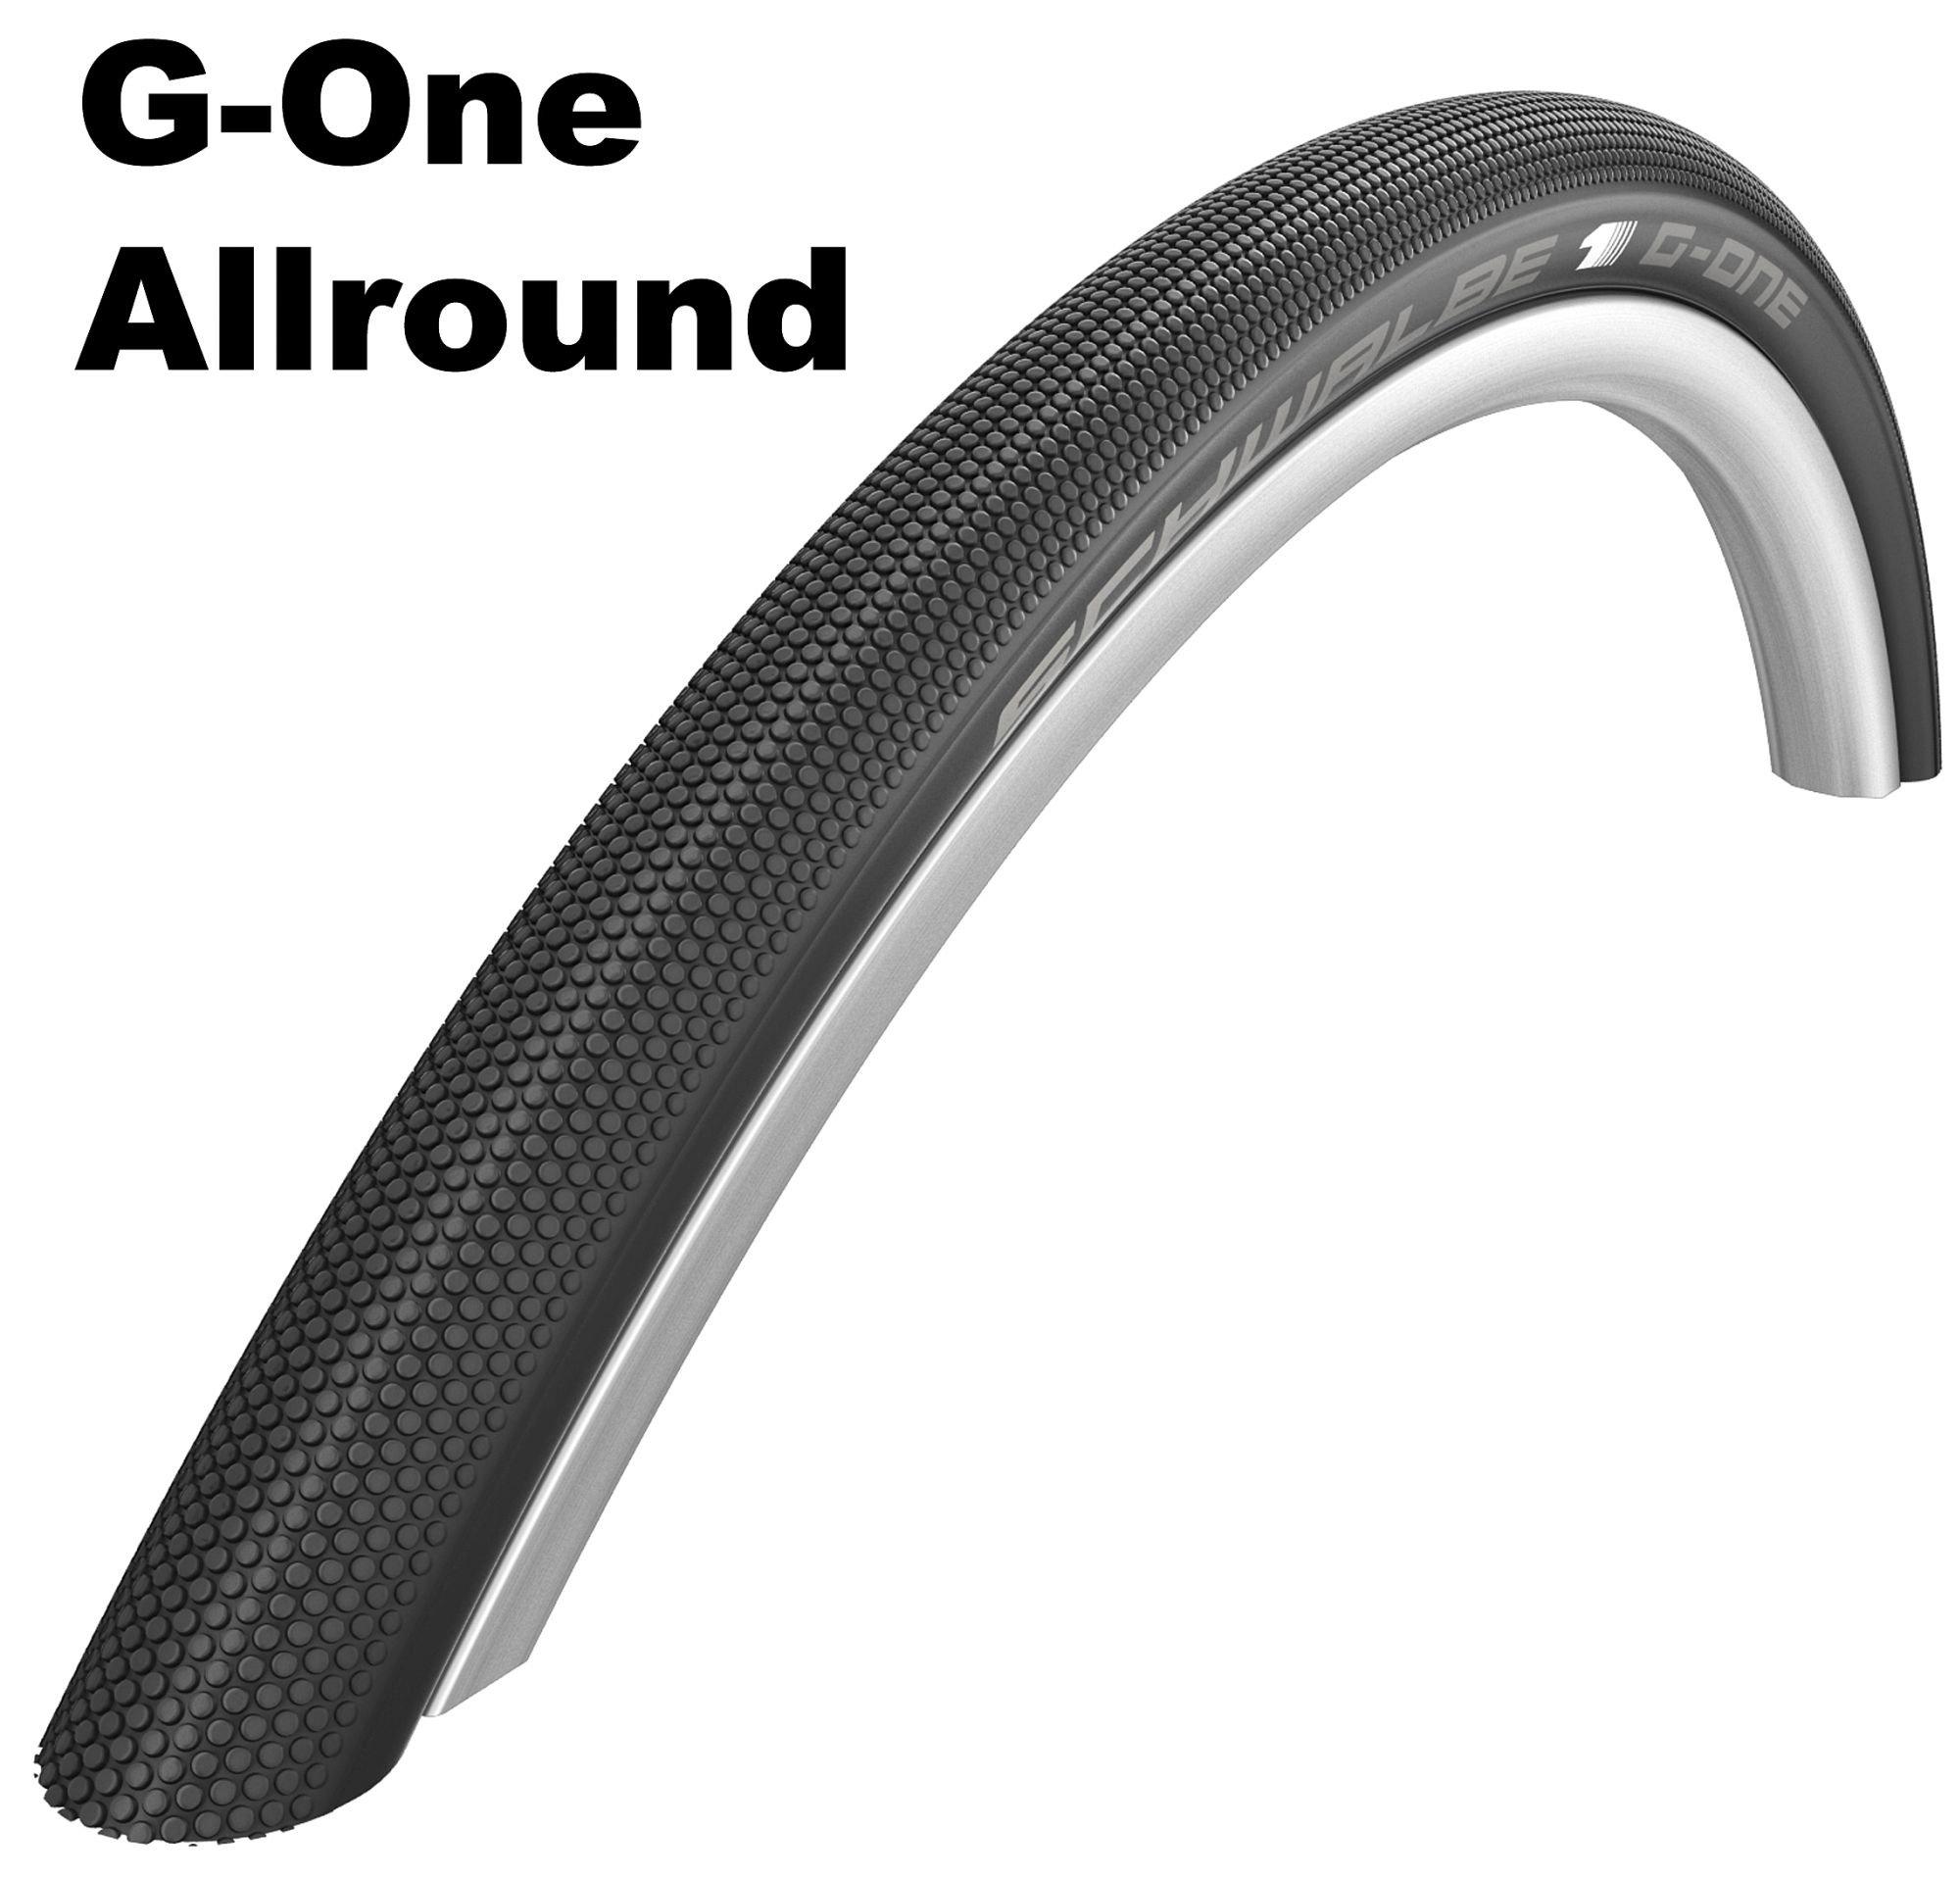 "Schwalbe Performance Line - RaceGuard,28"" G-One Allround 35-622"